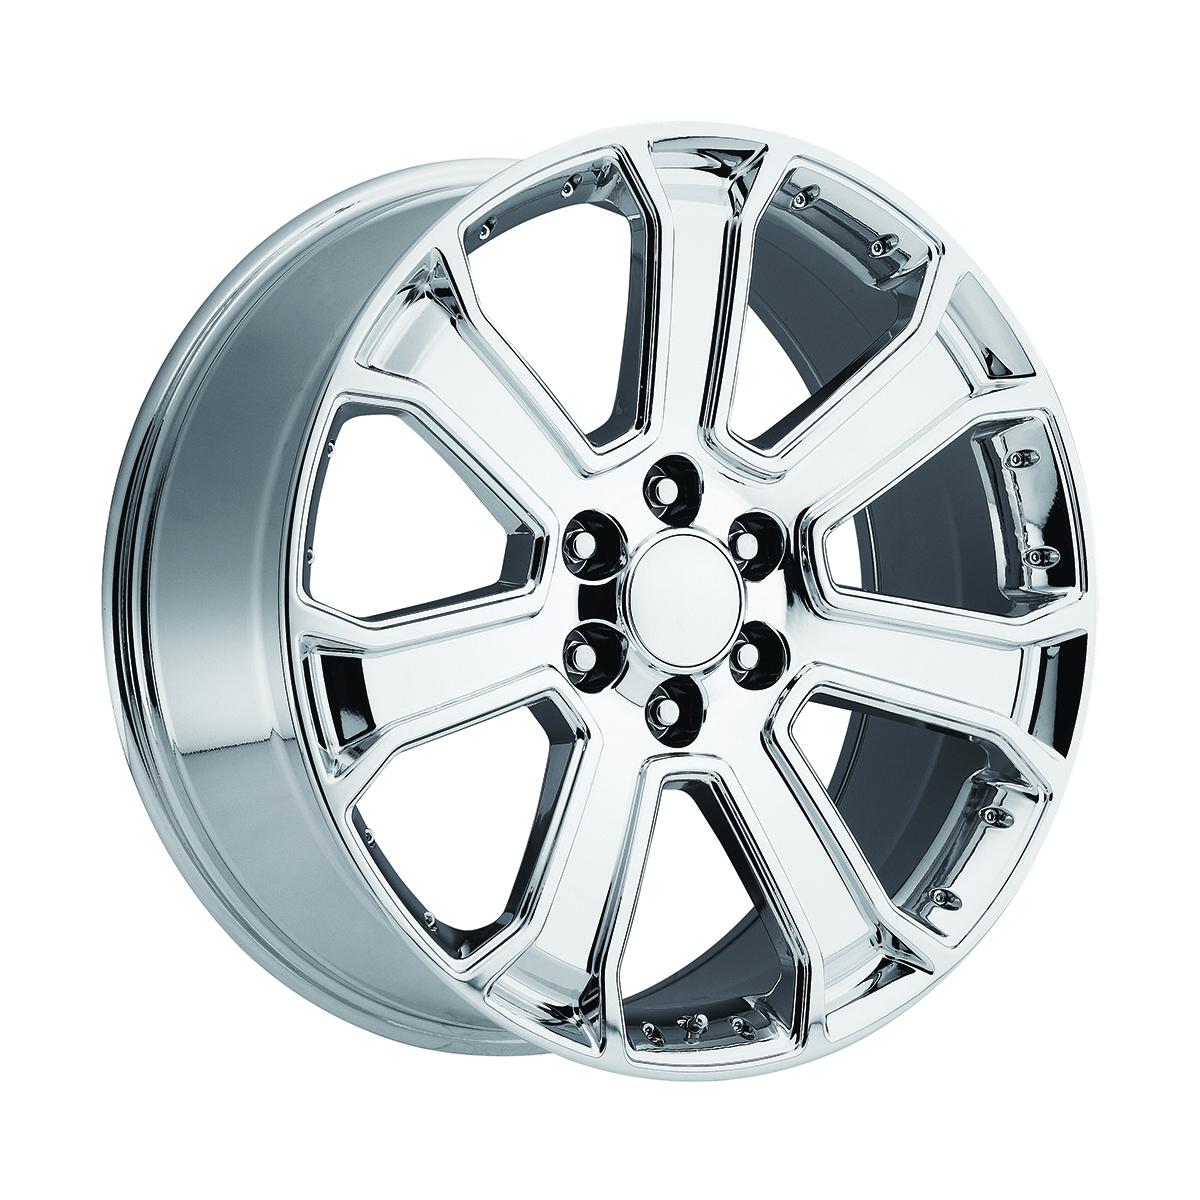 2015 Chevrolet/GMC Yukon Denali Chrome Replicas